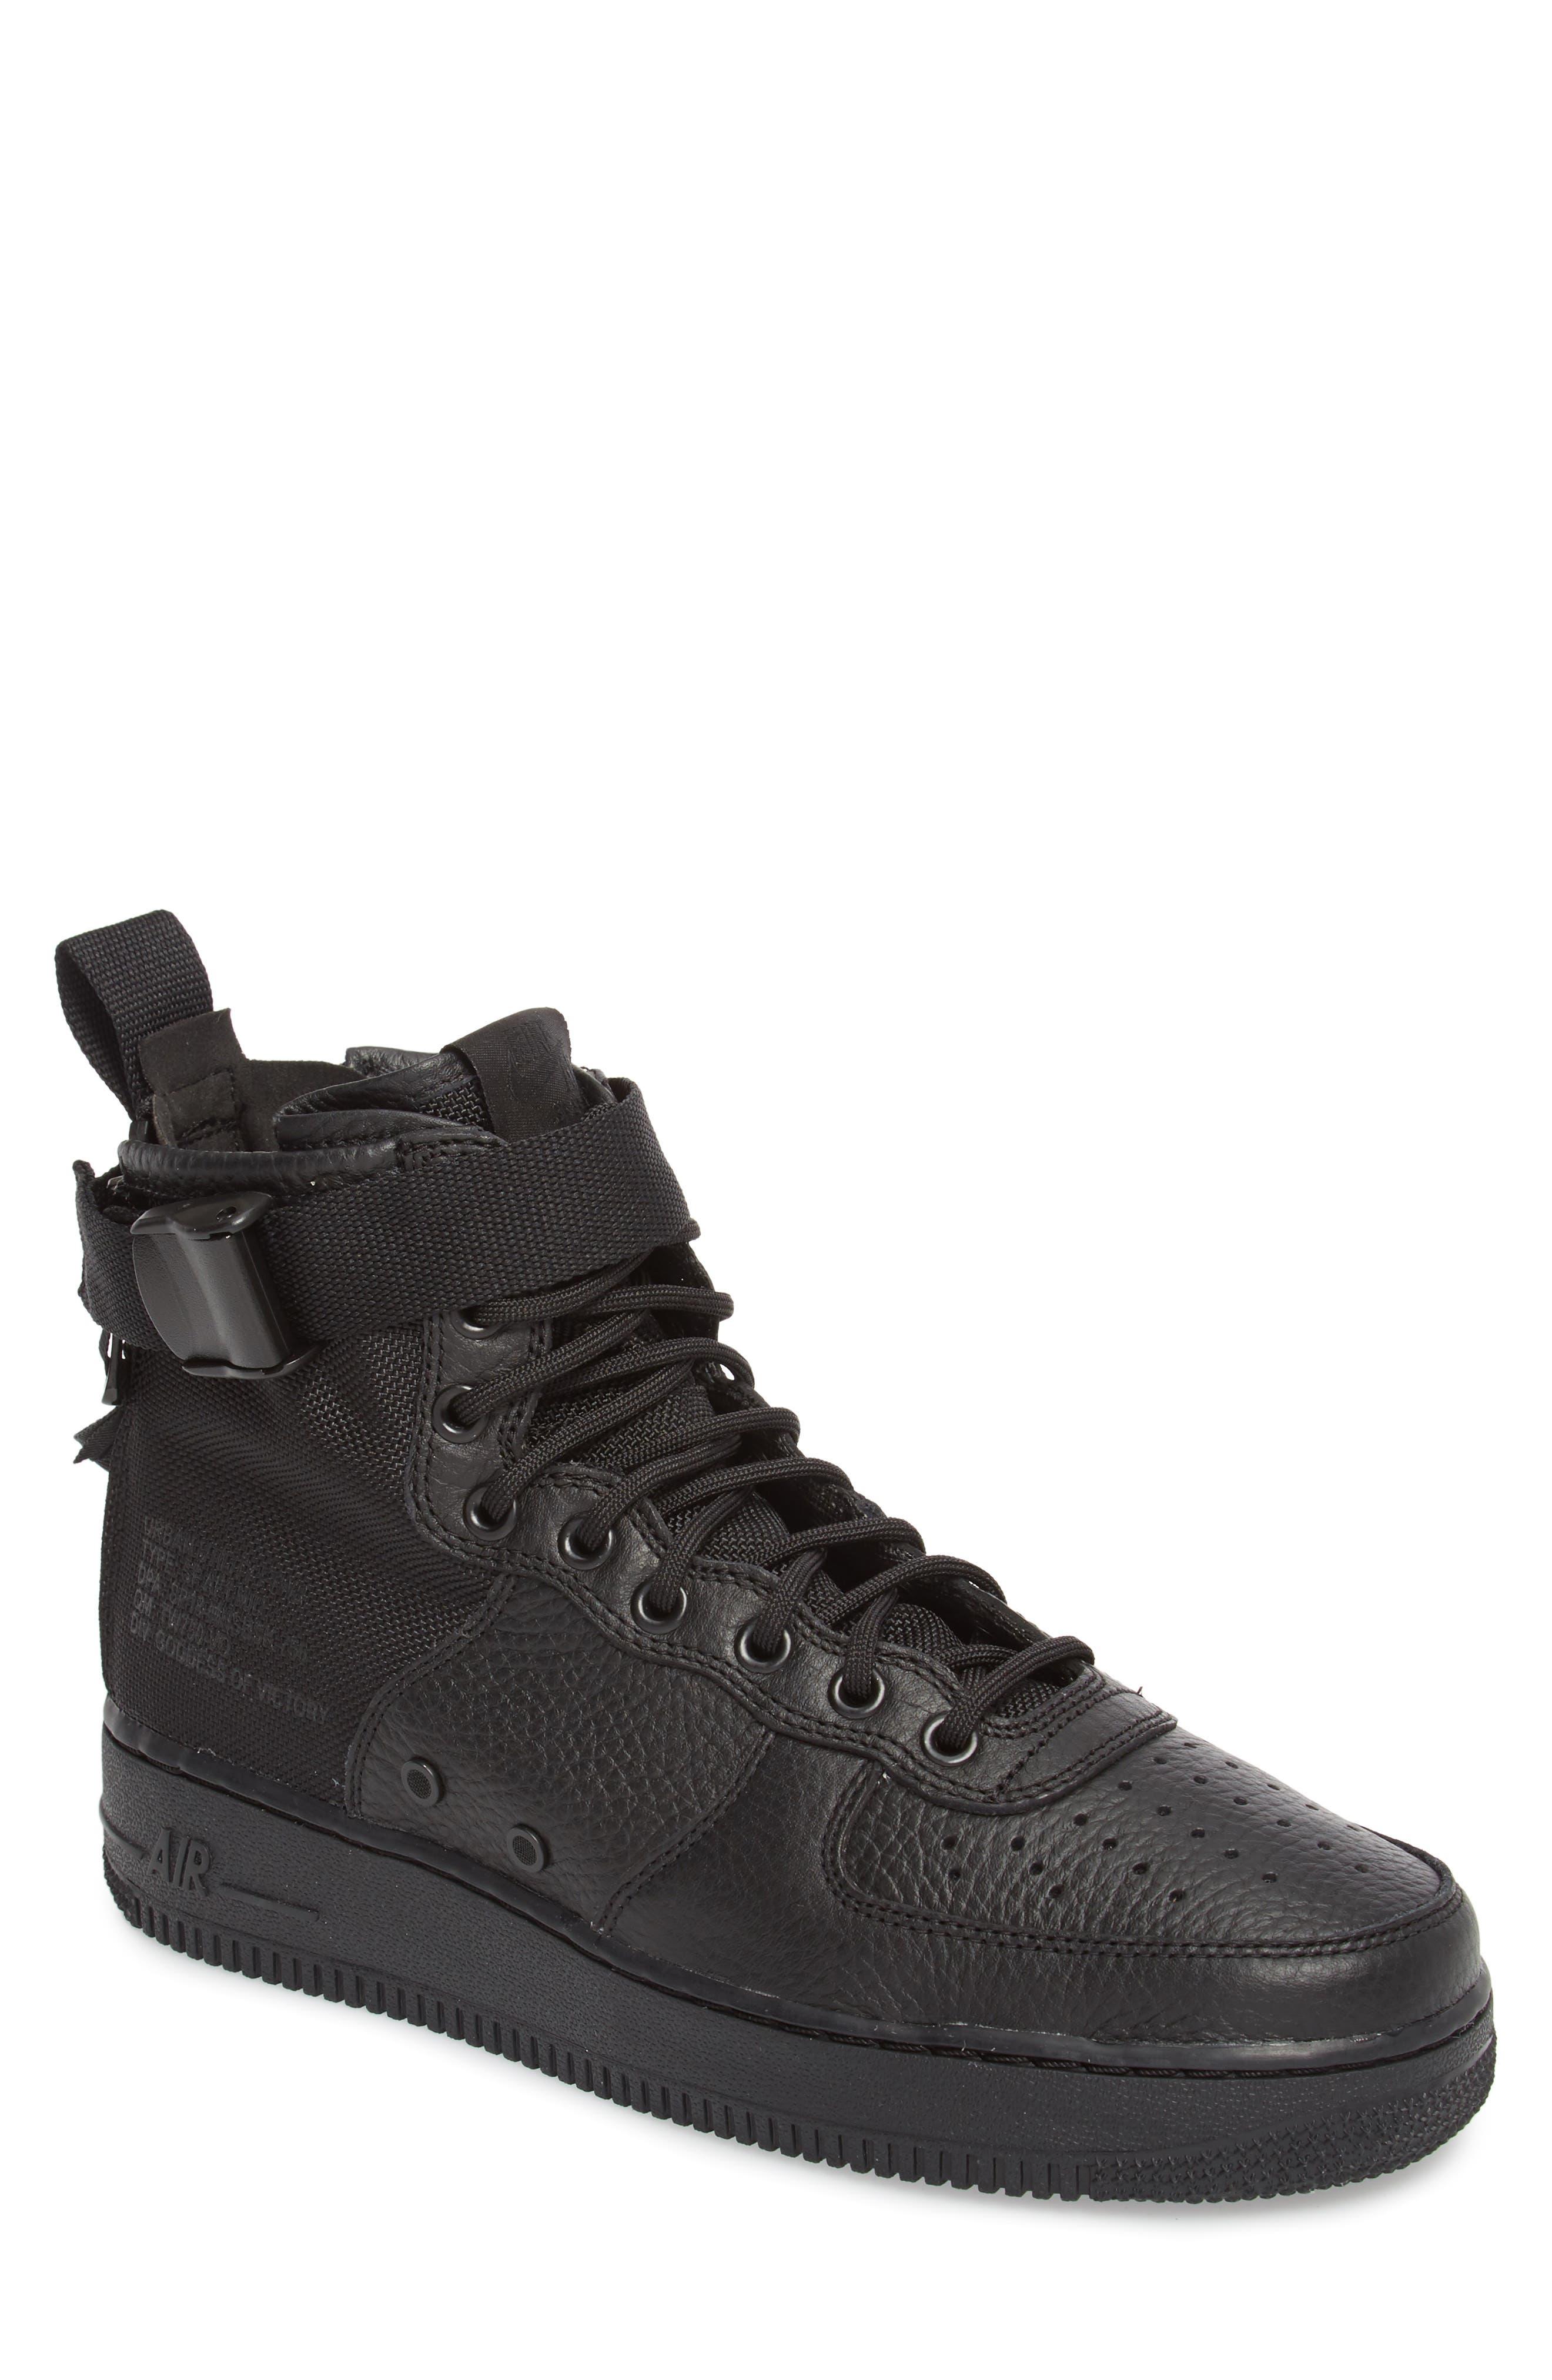 Alternate Image 1 Selected - Nike SF Air Force 1 Mid Sneaker (Men)